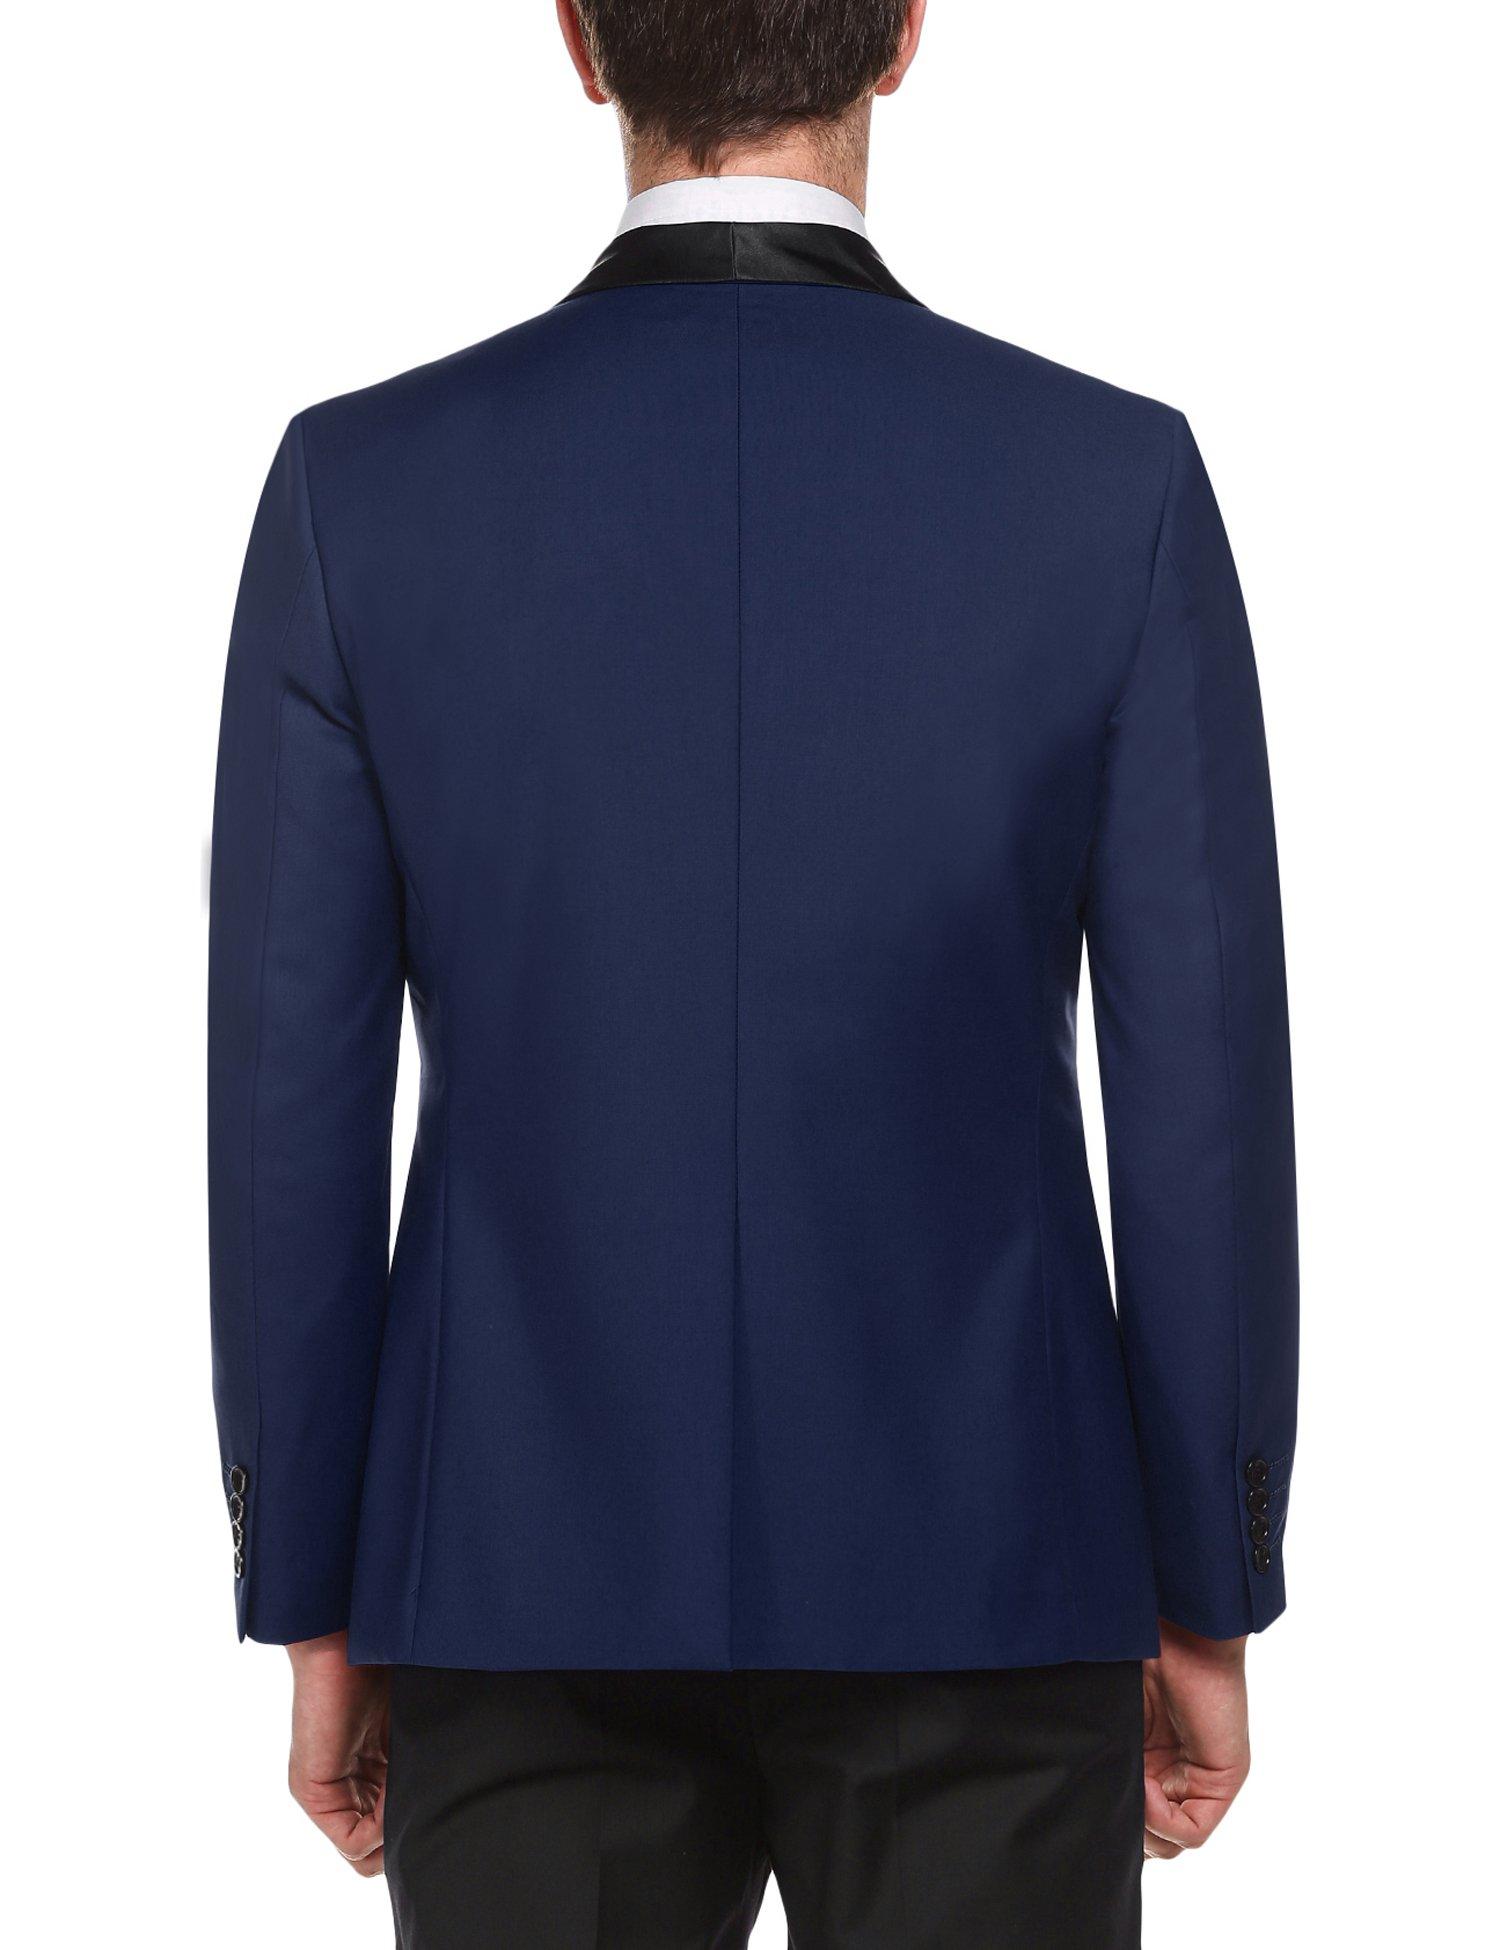 COOFANDY Men's Slim Fit Blazer Jacket Casual One Button Suit Coat by COOFANDY (Image #3)